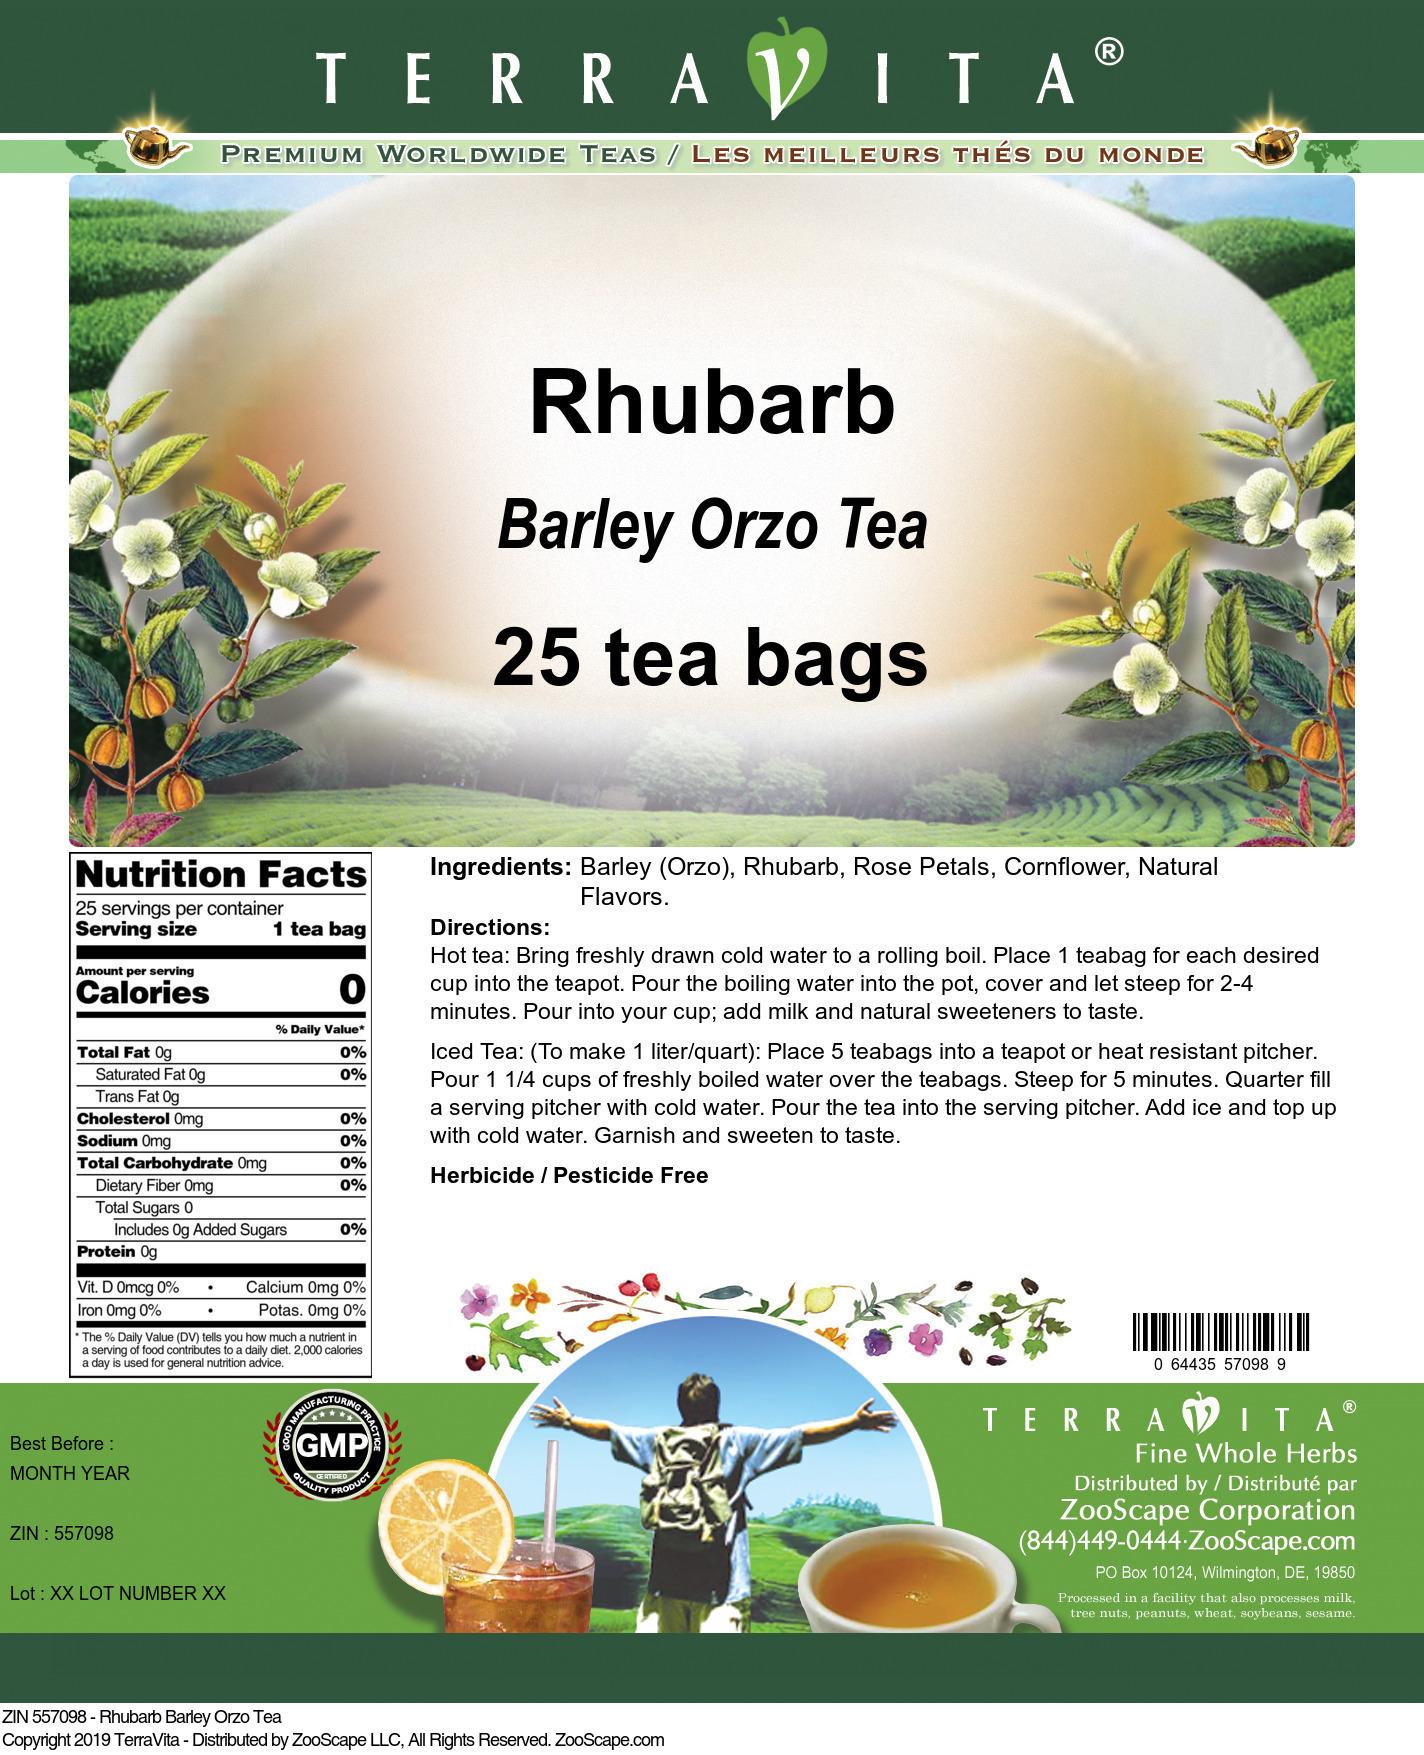 Rhubarb Barley Orzo